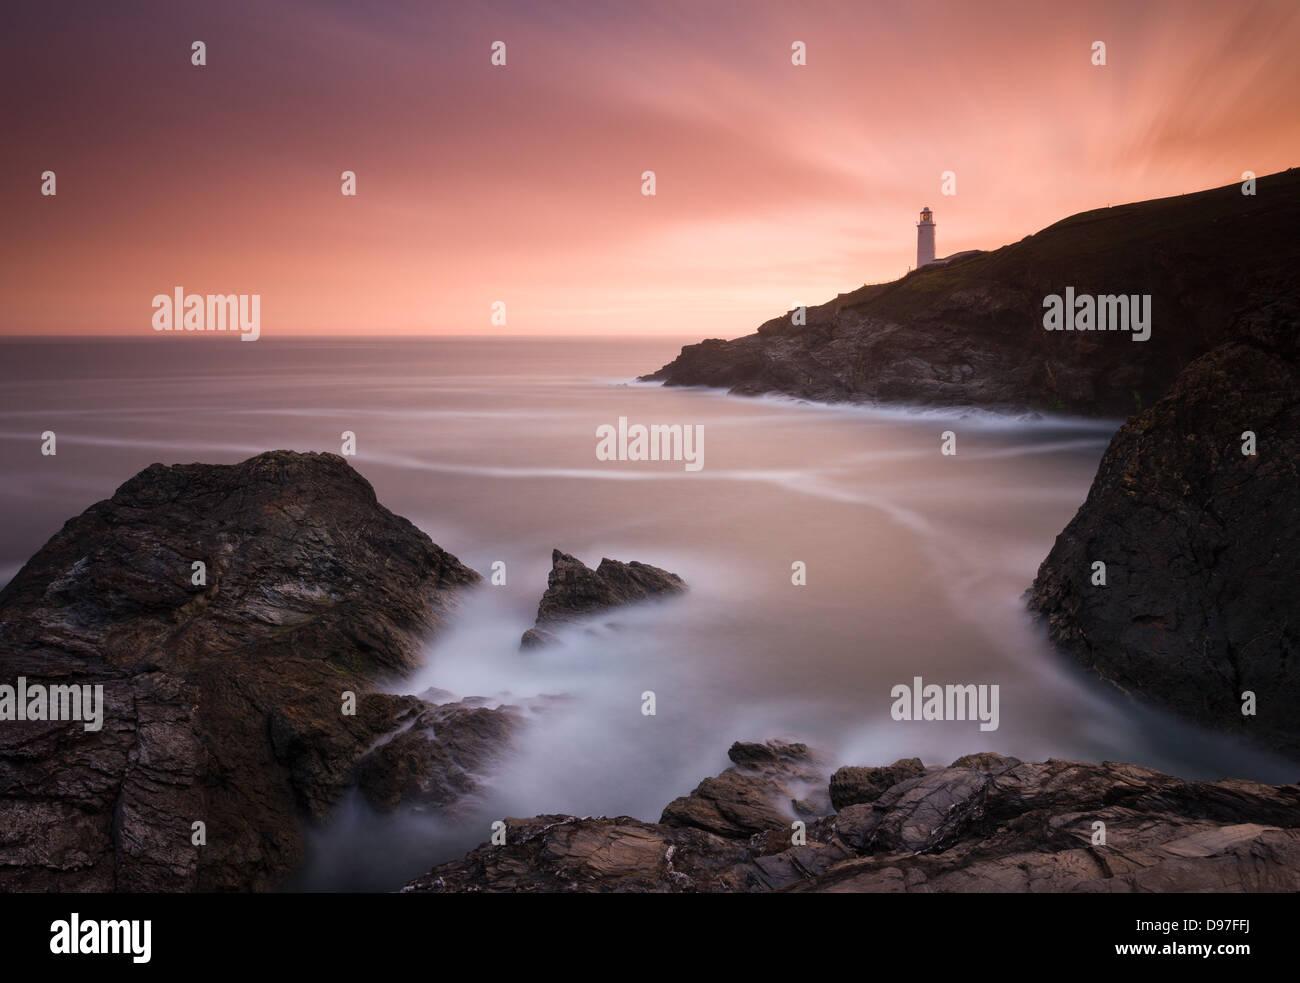 Trevose Head Lighthouse at sunrise, Cornwall. - Stock Image